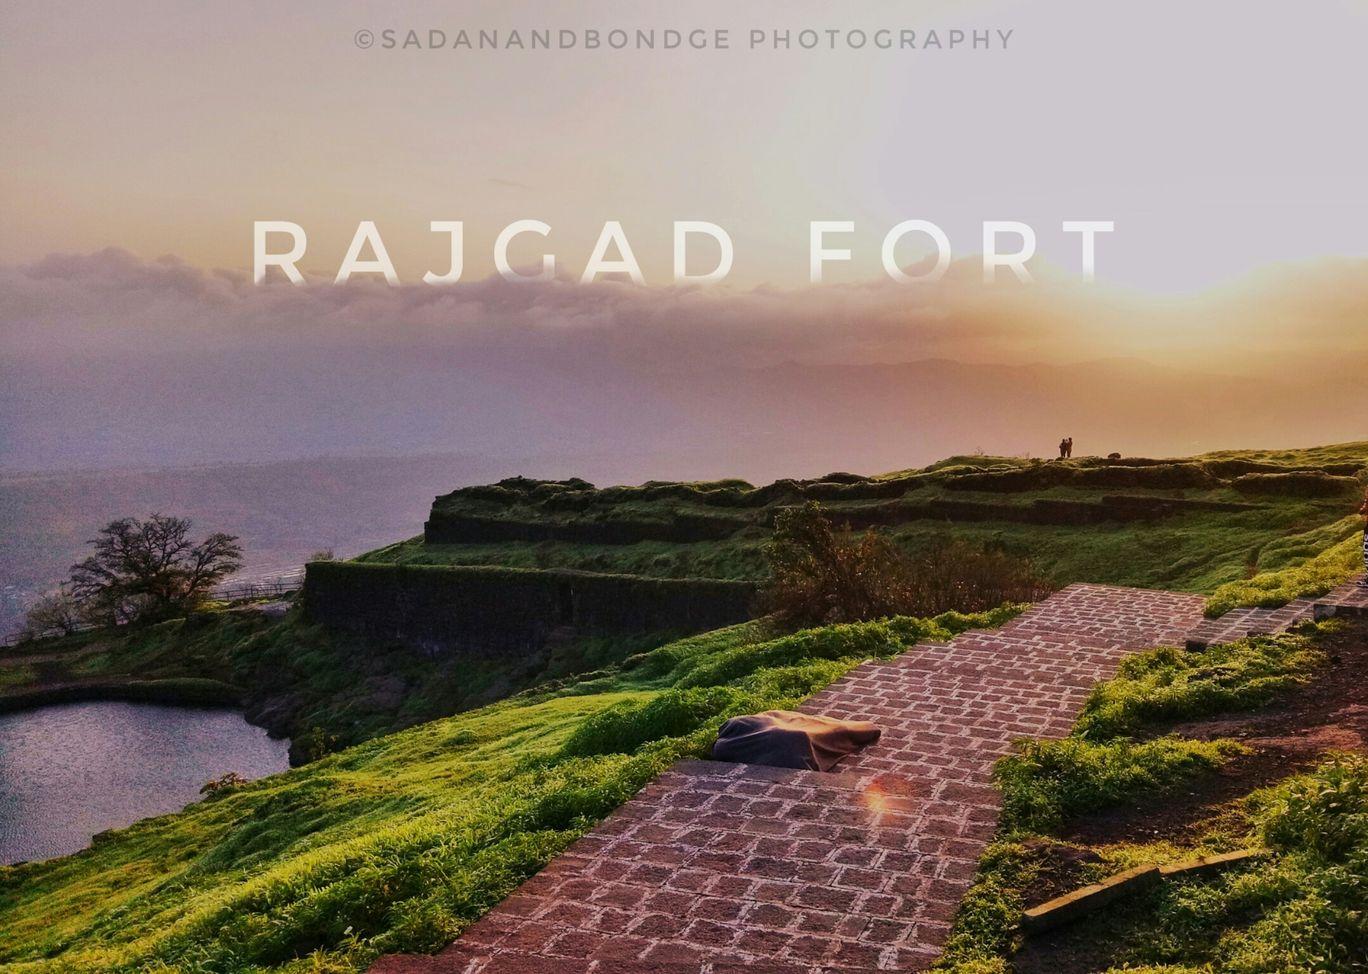 Photo of Rajgad Fort By Sadanand Bondge